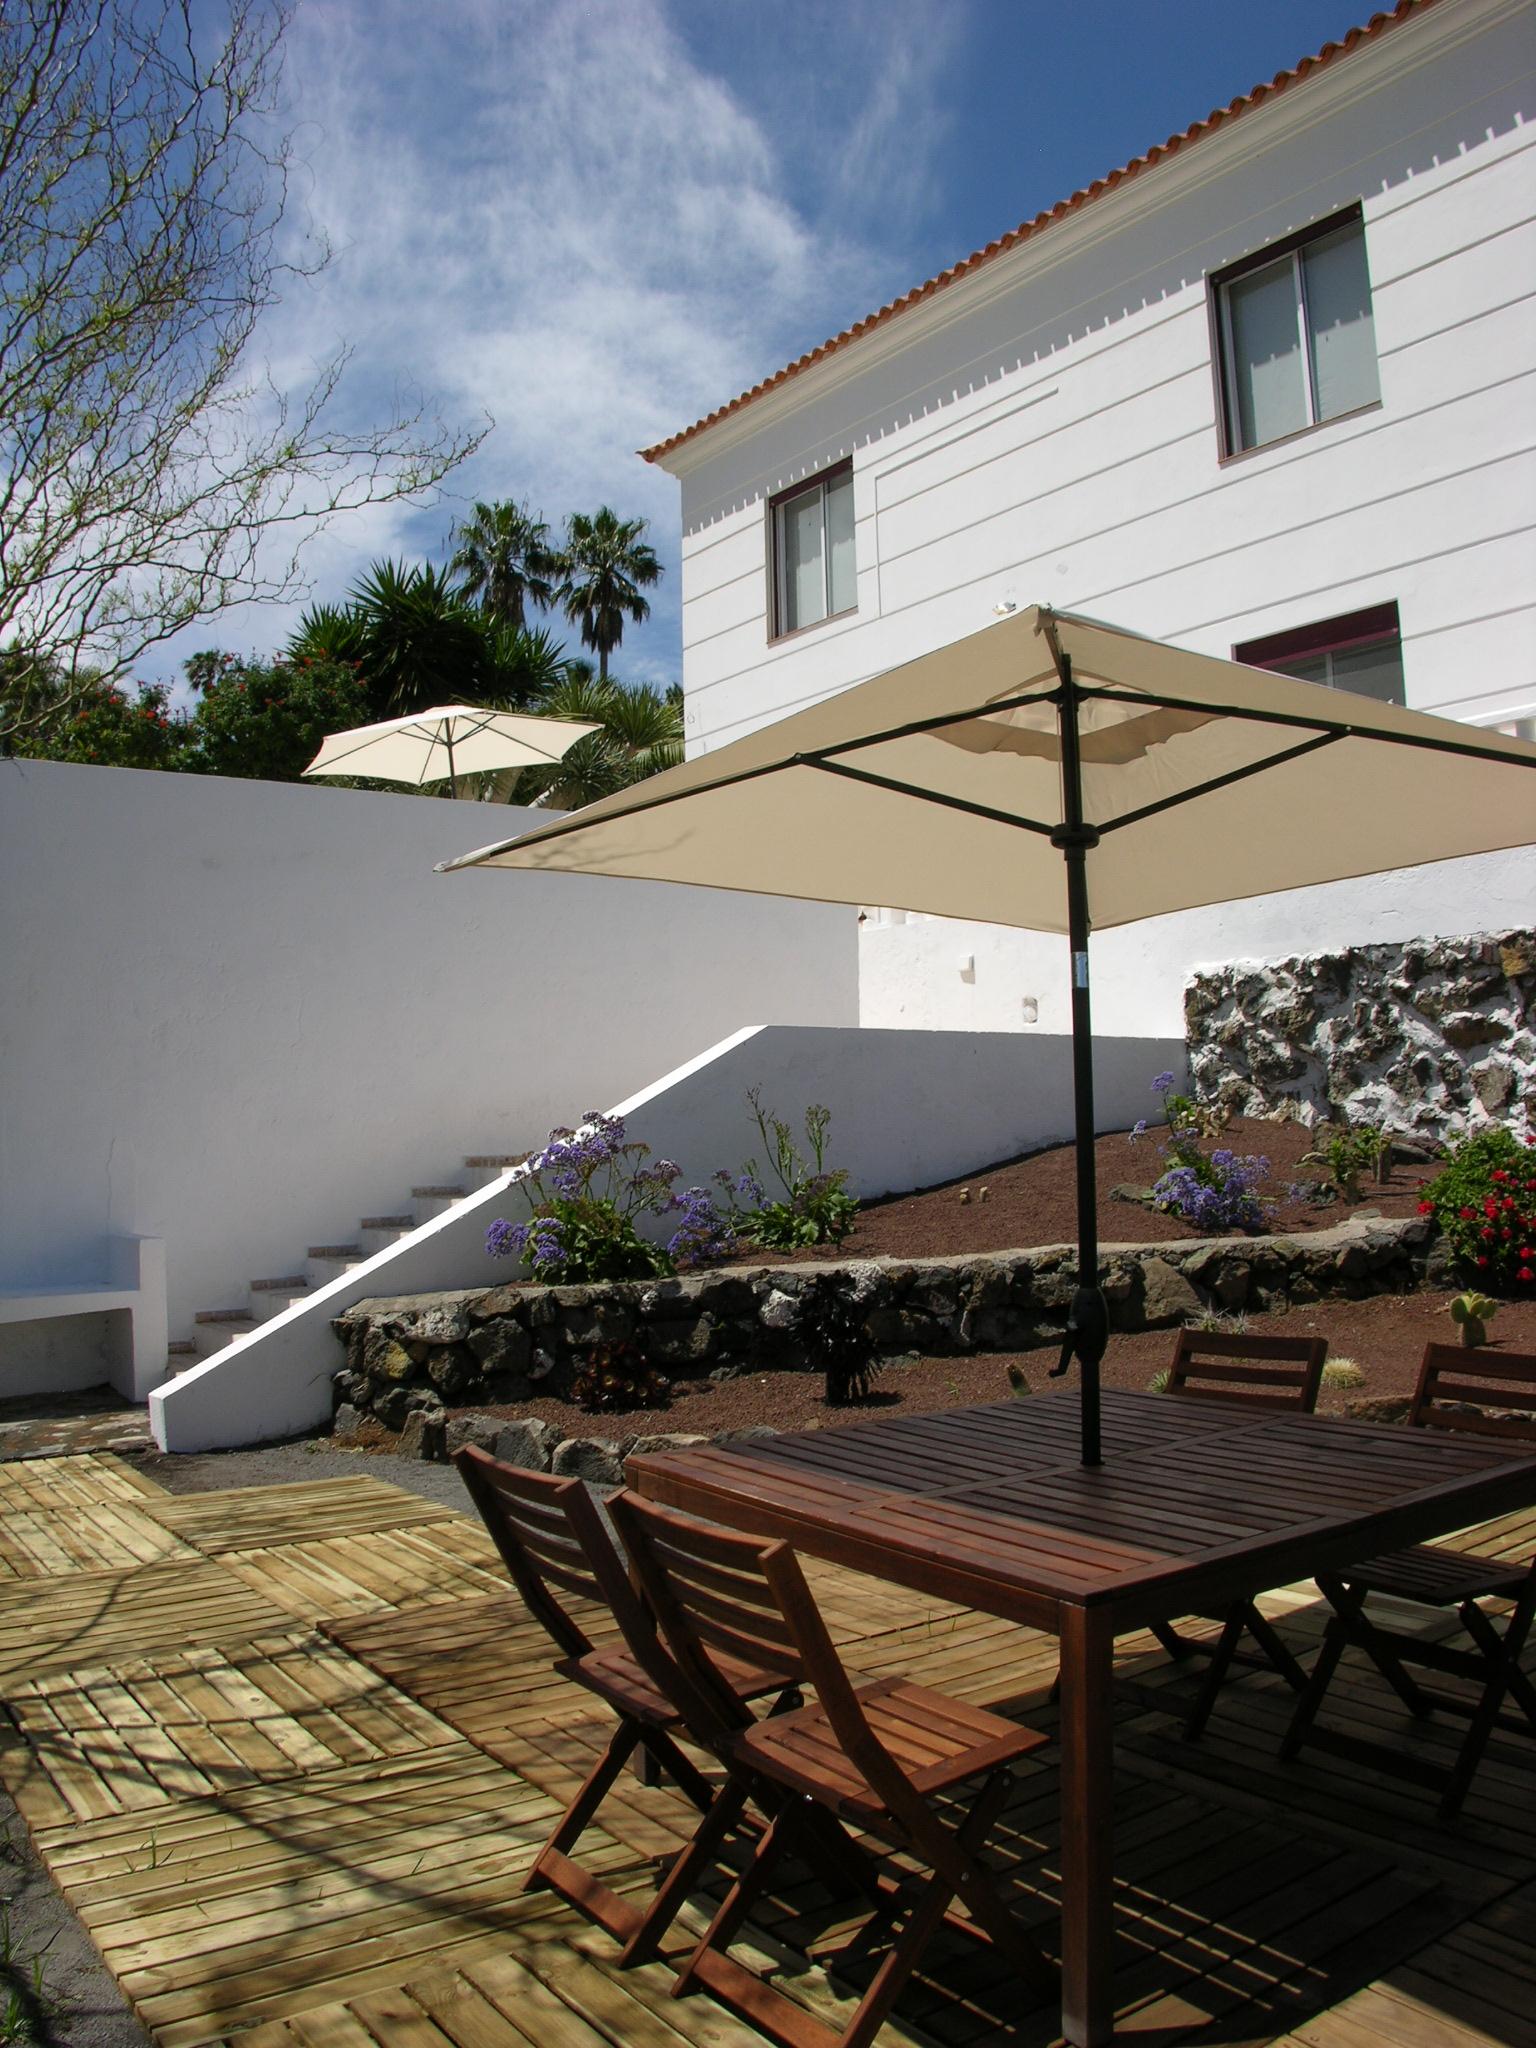 Maison de vacances Villa Vista La Quinta beheizbarer Pool kostenloses WLAN Grill (2124407), Santa Ursula, Ténérife, Iles Canaries, Espagne, image 6